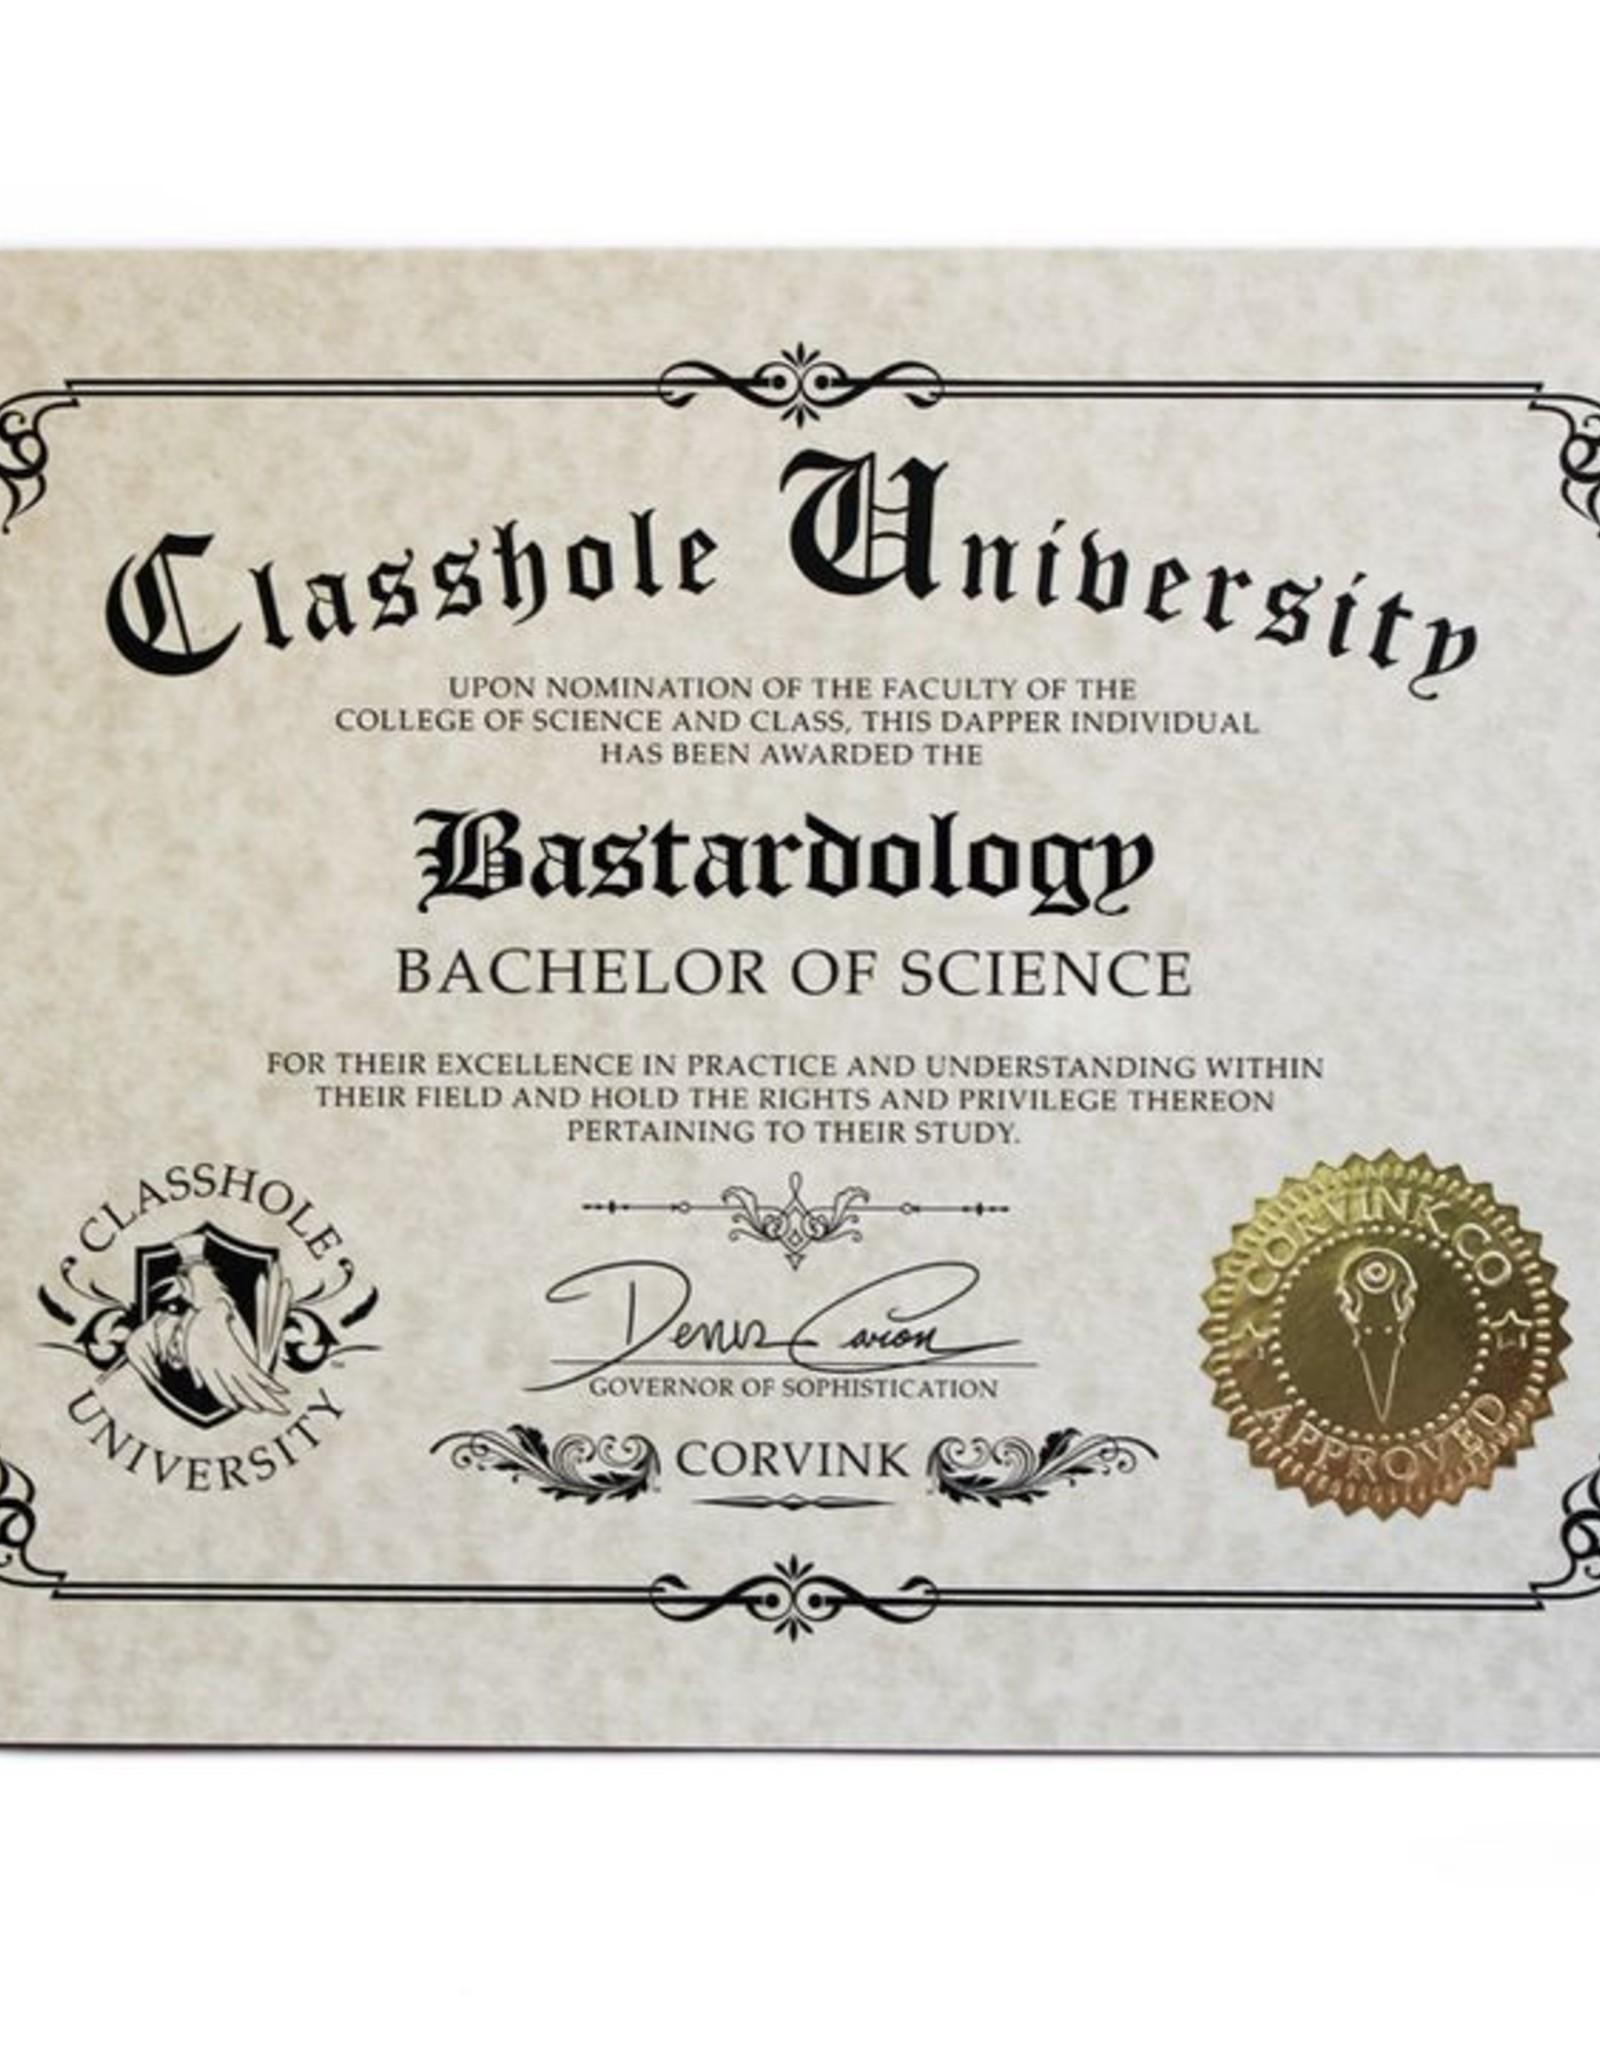 Classhole University BS Diplomas - Bastardology